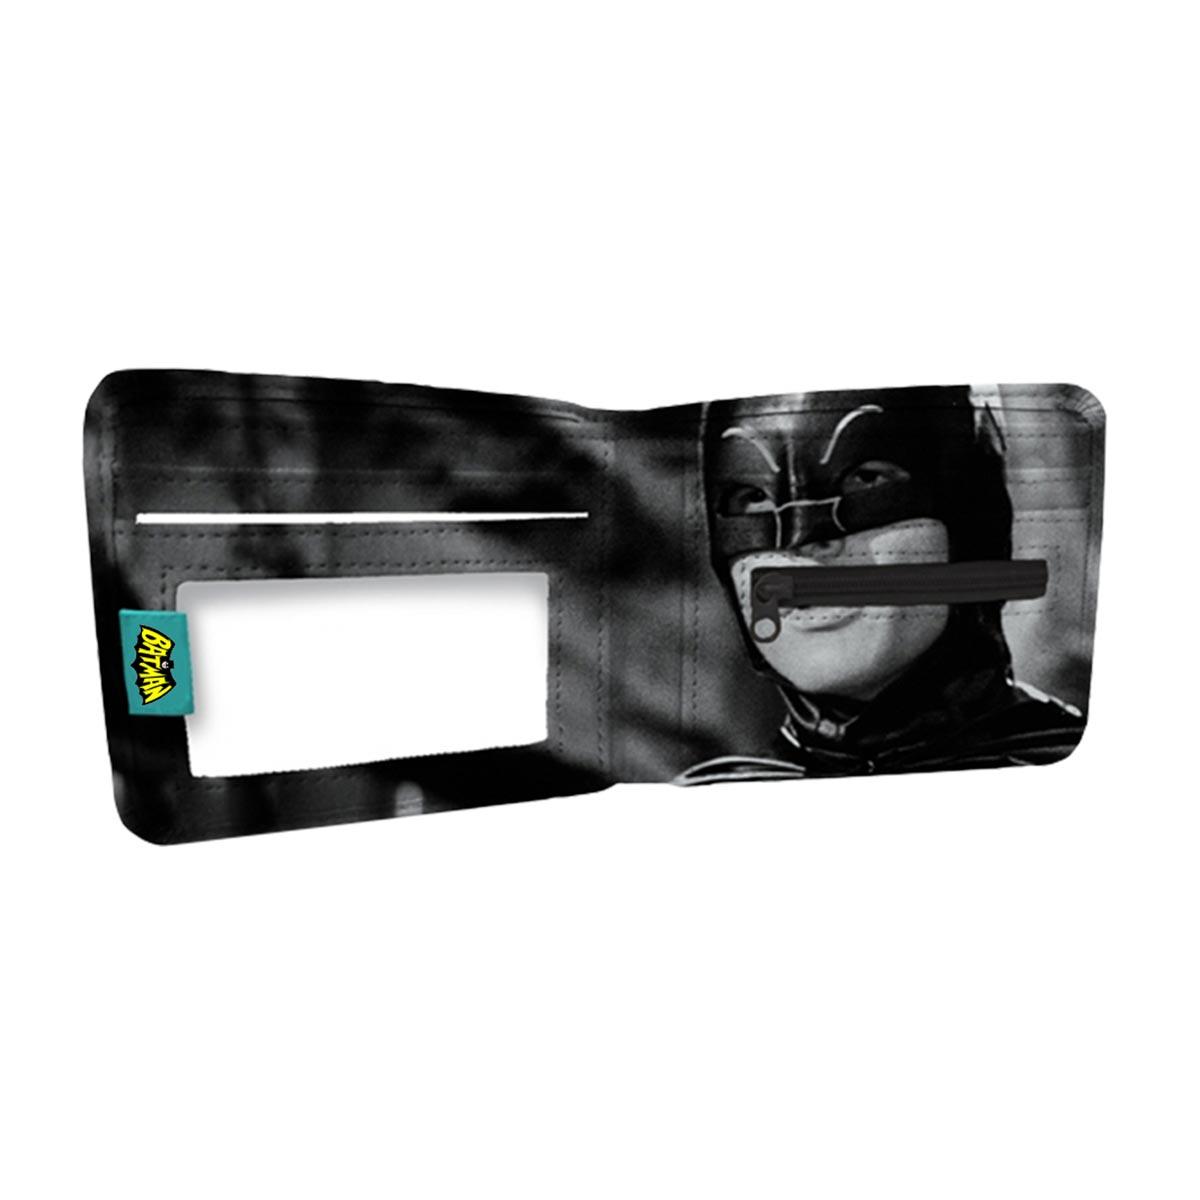 Carteira Movie Batman and Robin P&B